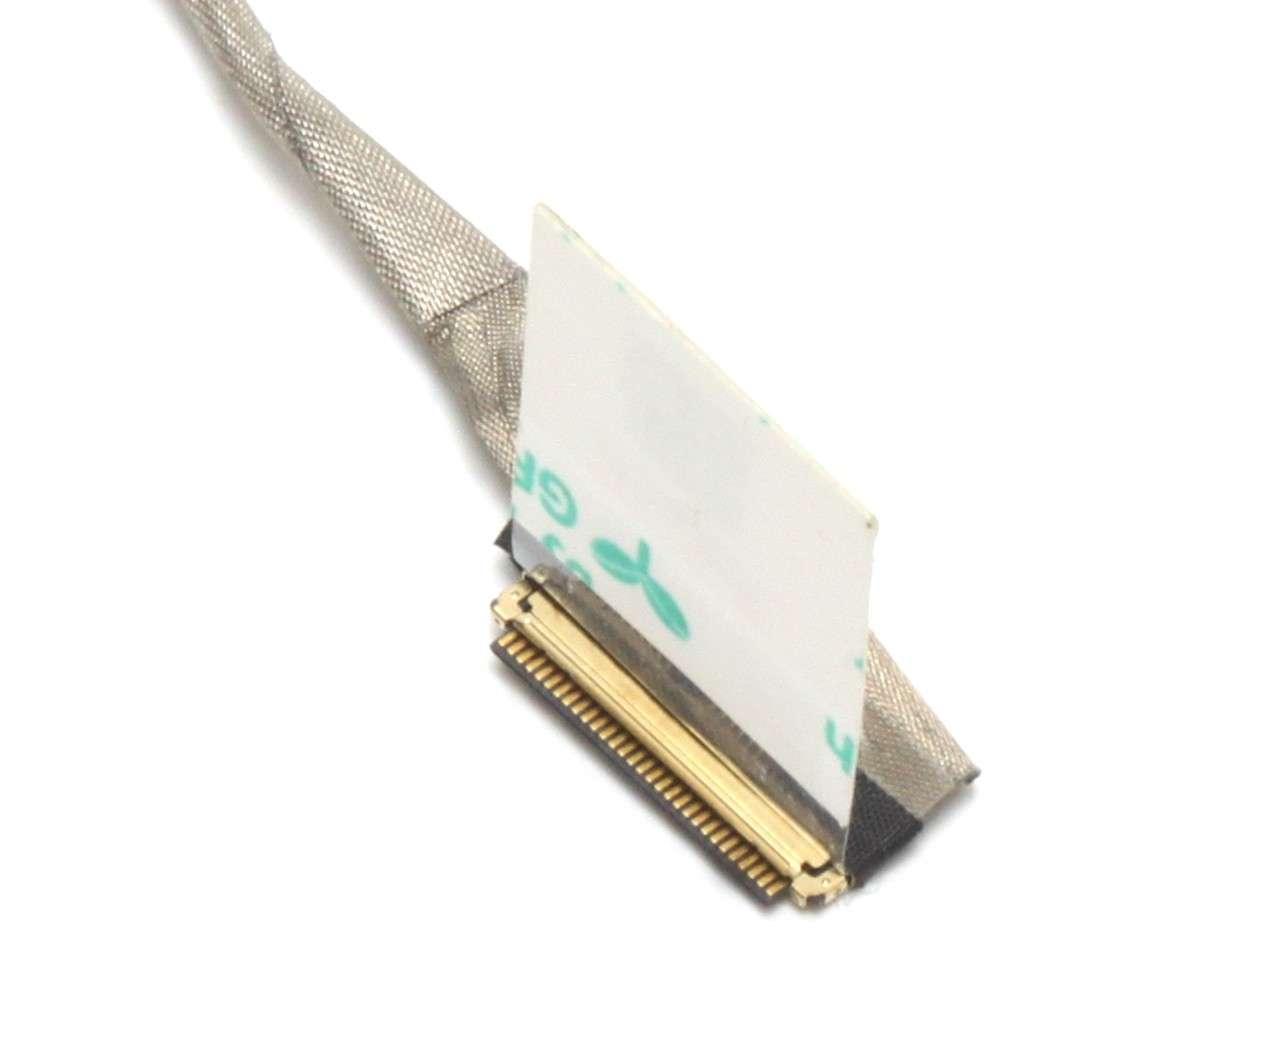 Cablu video LVDS Acer DD0ZRTLC140 30 pini FULL HD 1920x1080 fara touchscreen imagine powerlaptop.ro 2021